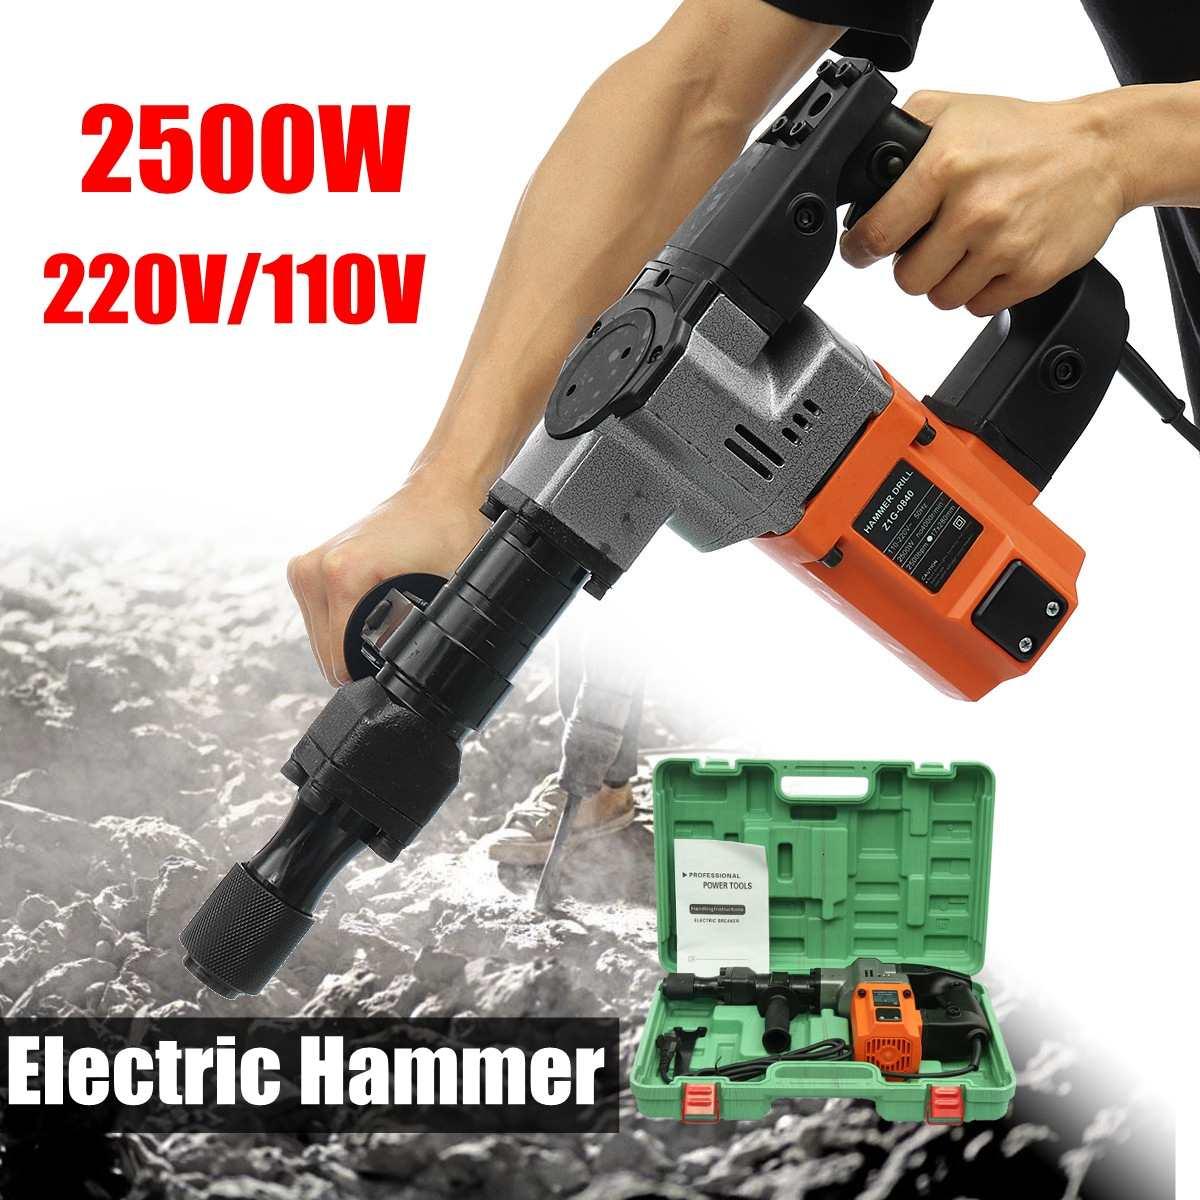 110V/120V 2500W Electric Demolition Jack Hammer Rotary Jackhammer Electric Concrete Drill  2500BPM 4000r/min|Electric Hammers| |  - title=